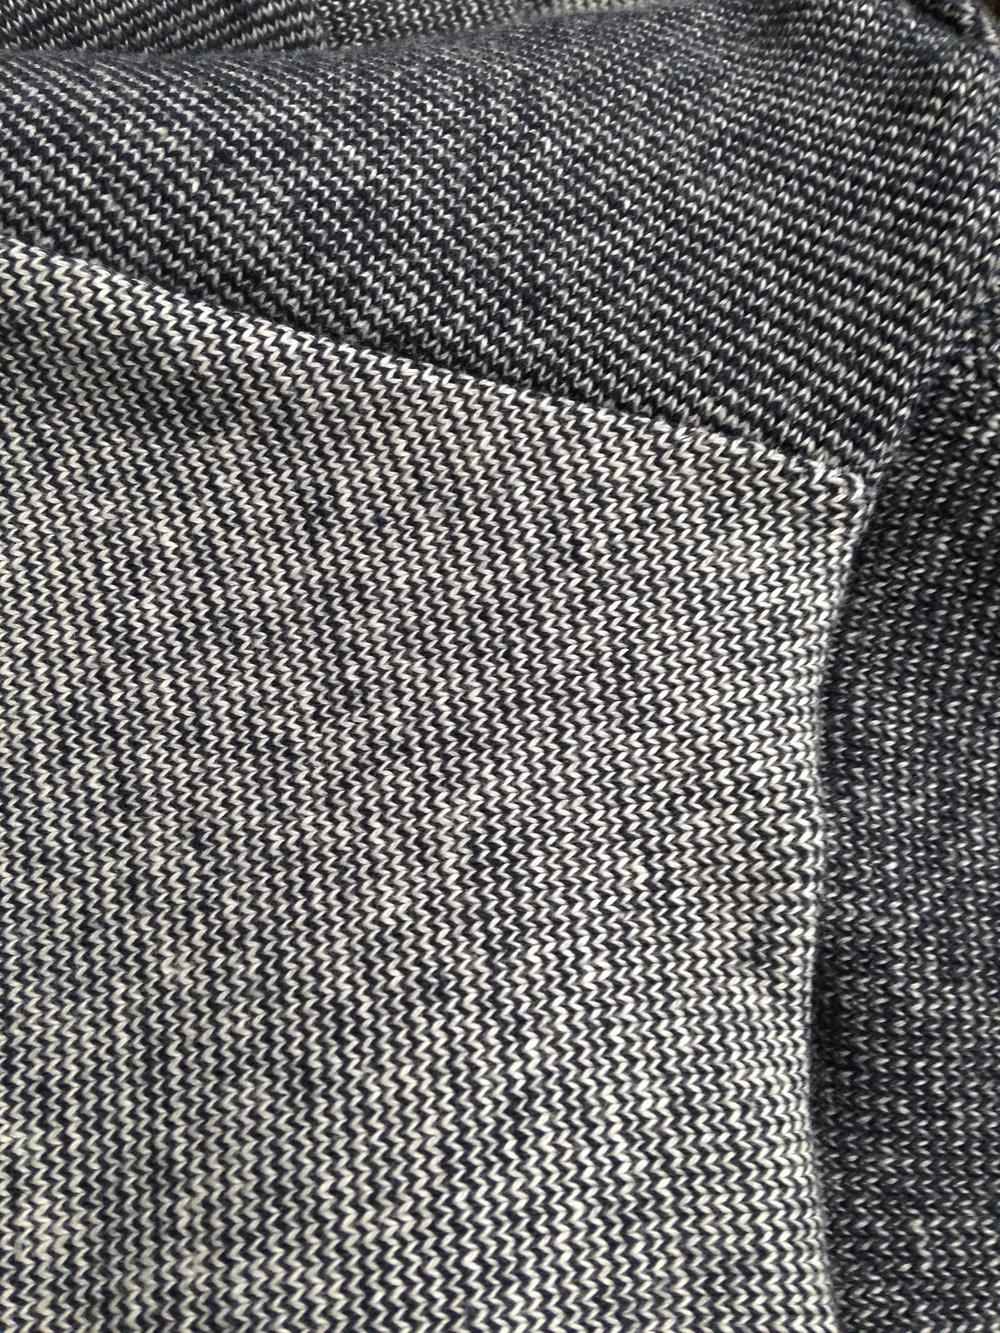 Sweatshirt fabric closeup